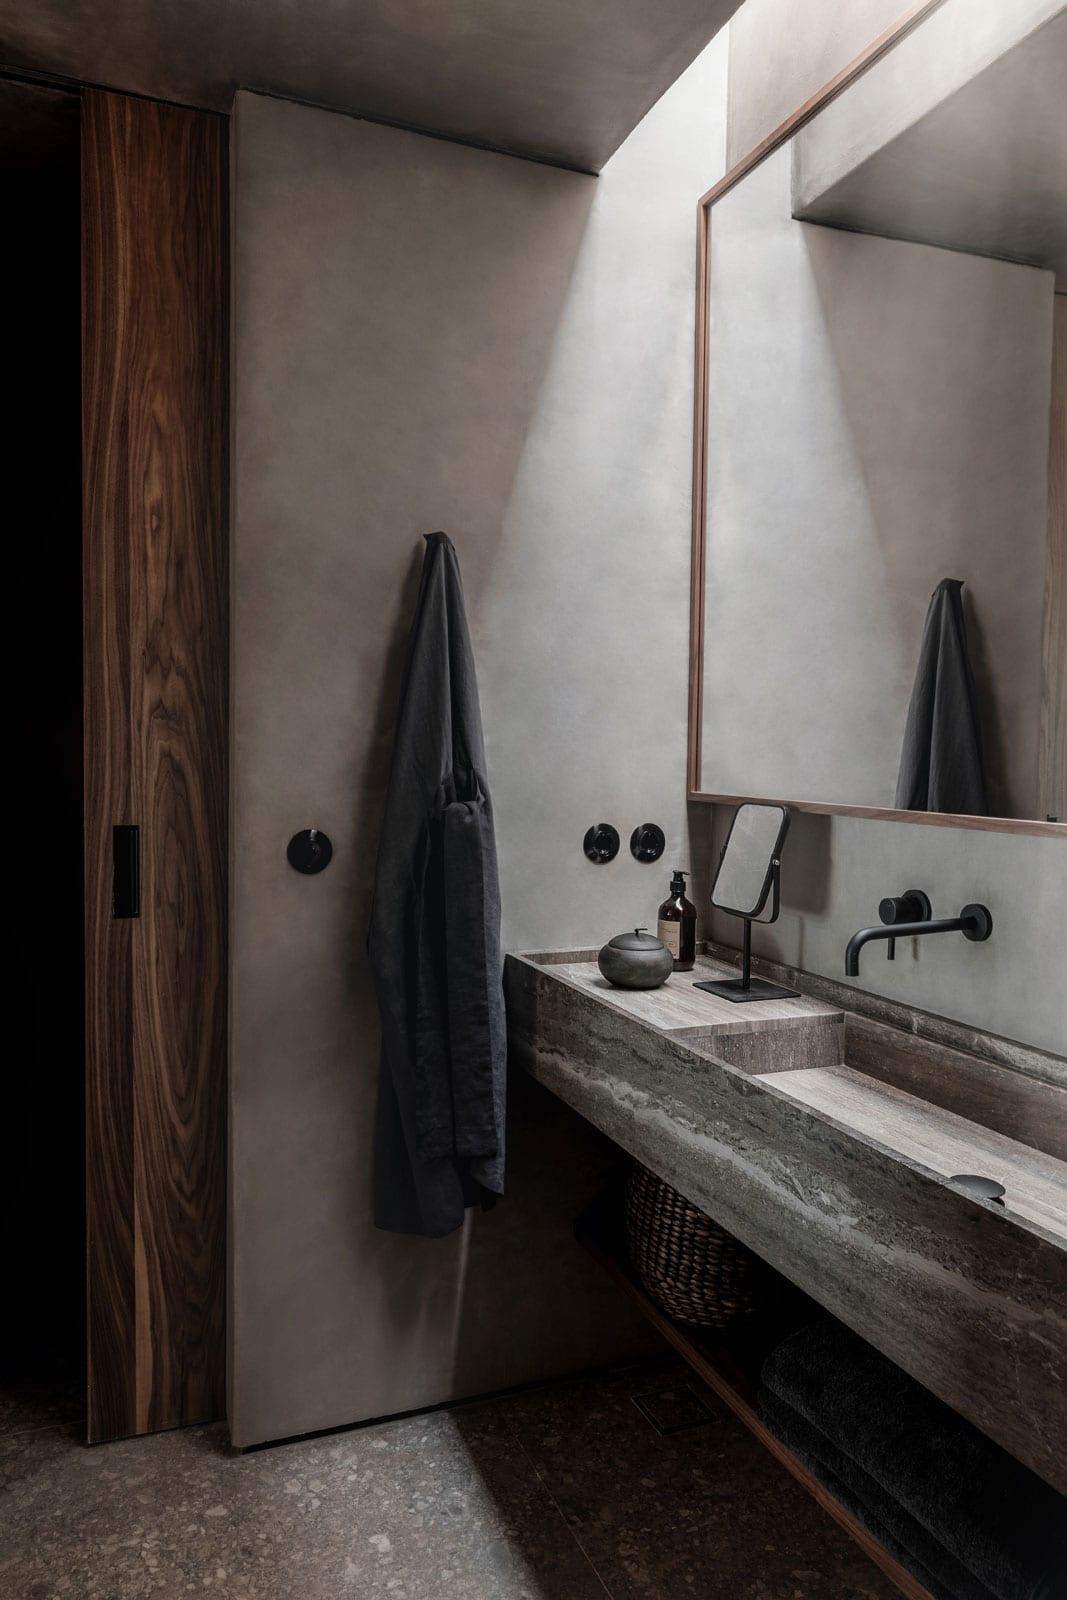 Casa Cook Chania On Greek Island Crete Bathroom Interior